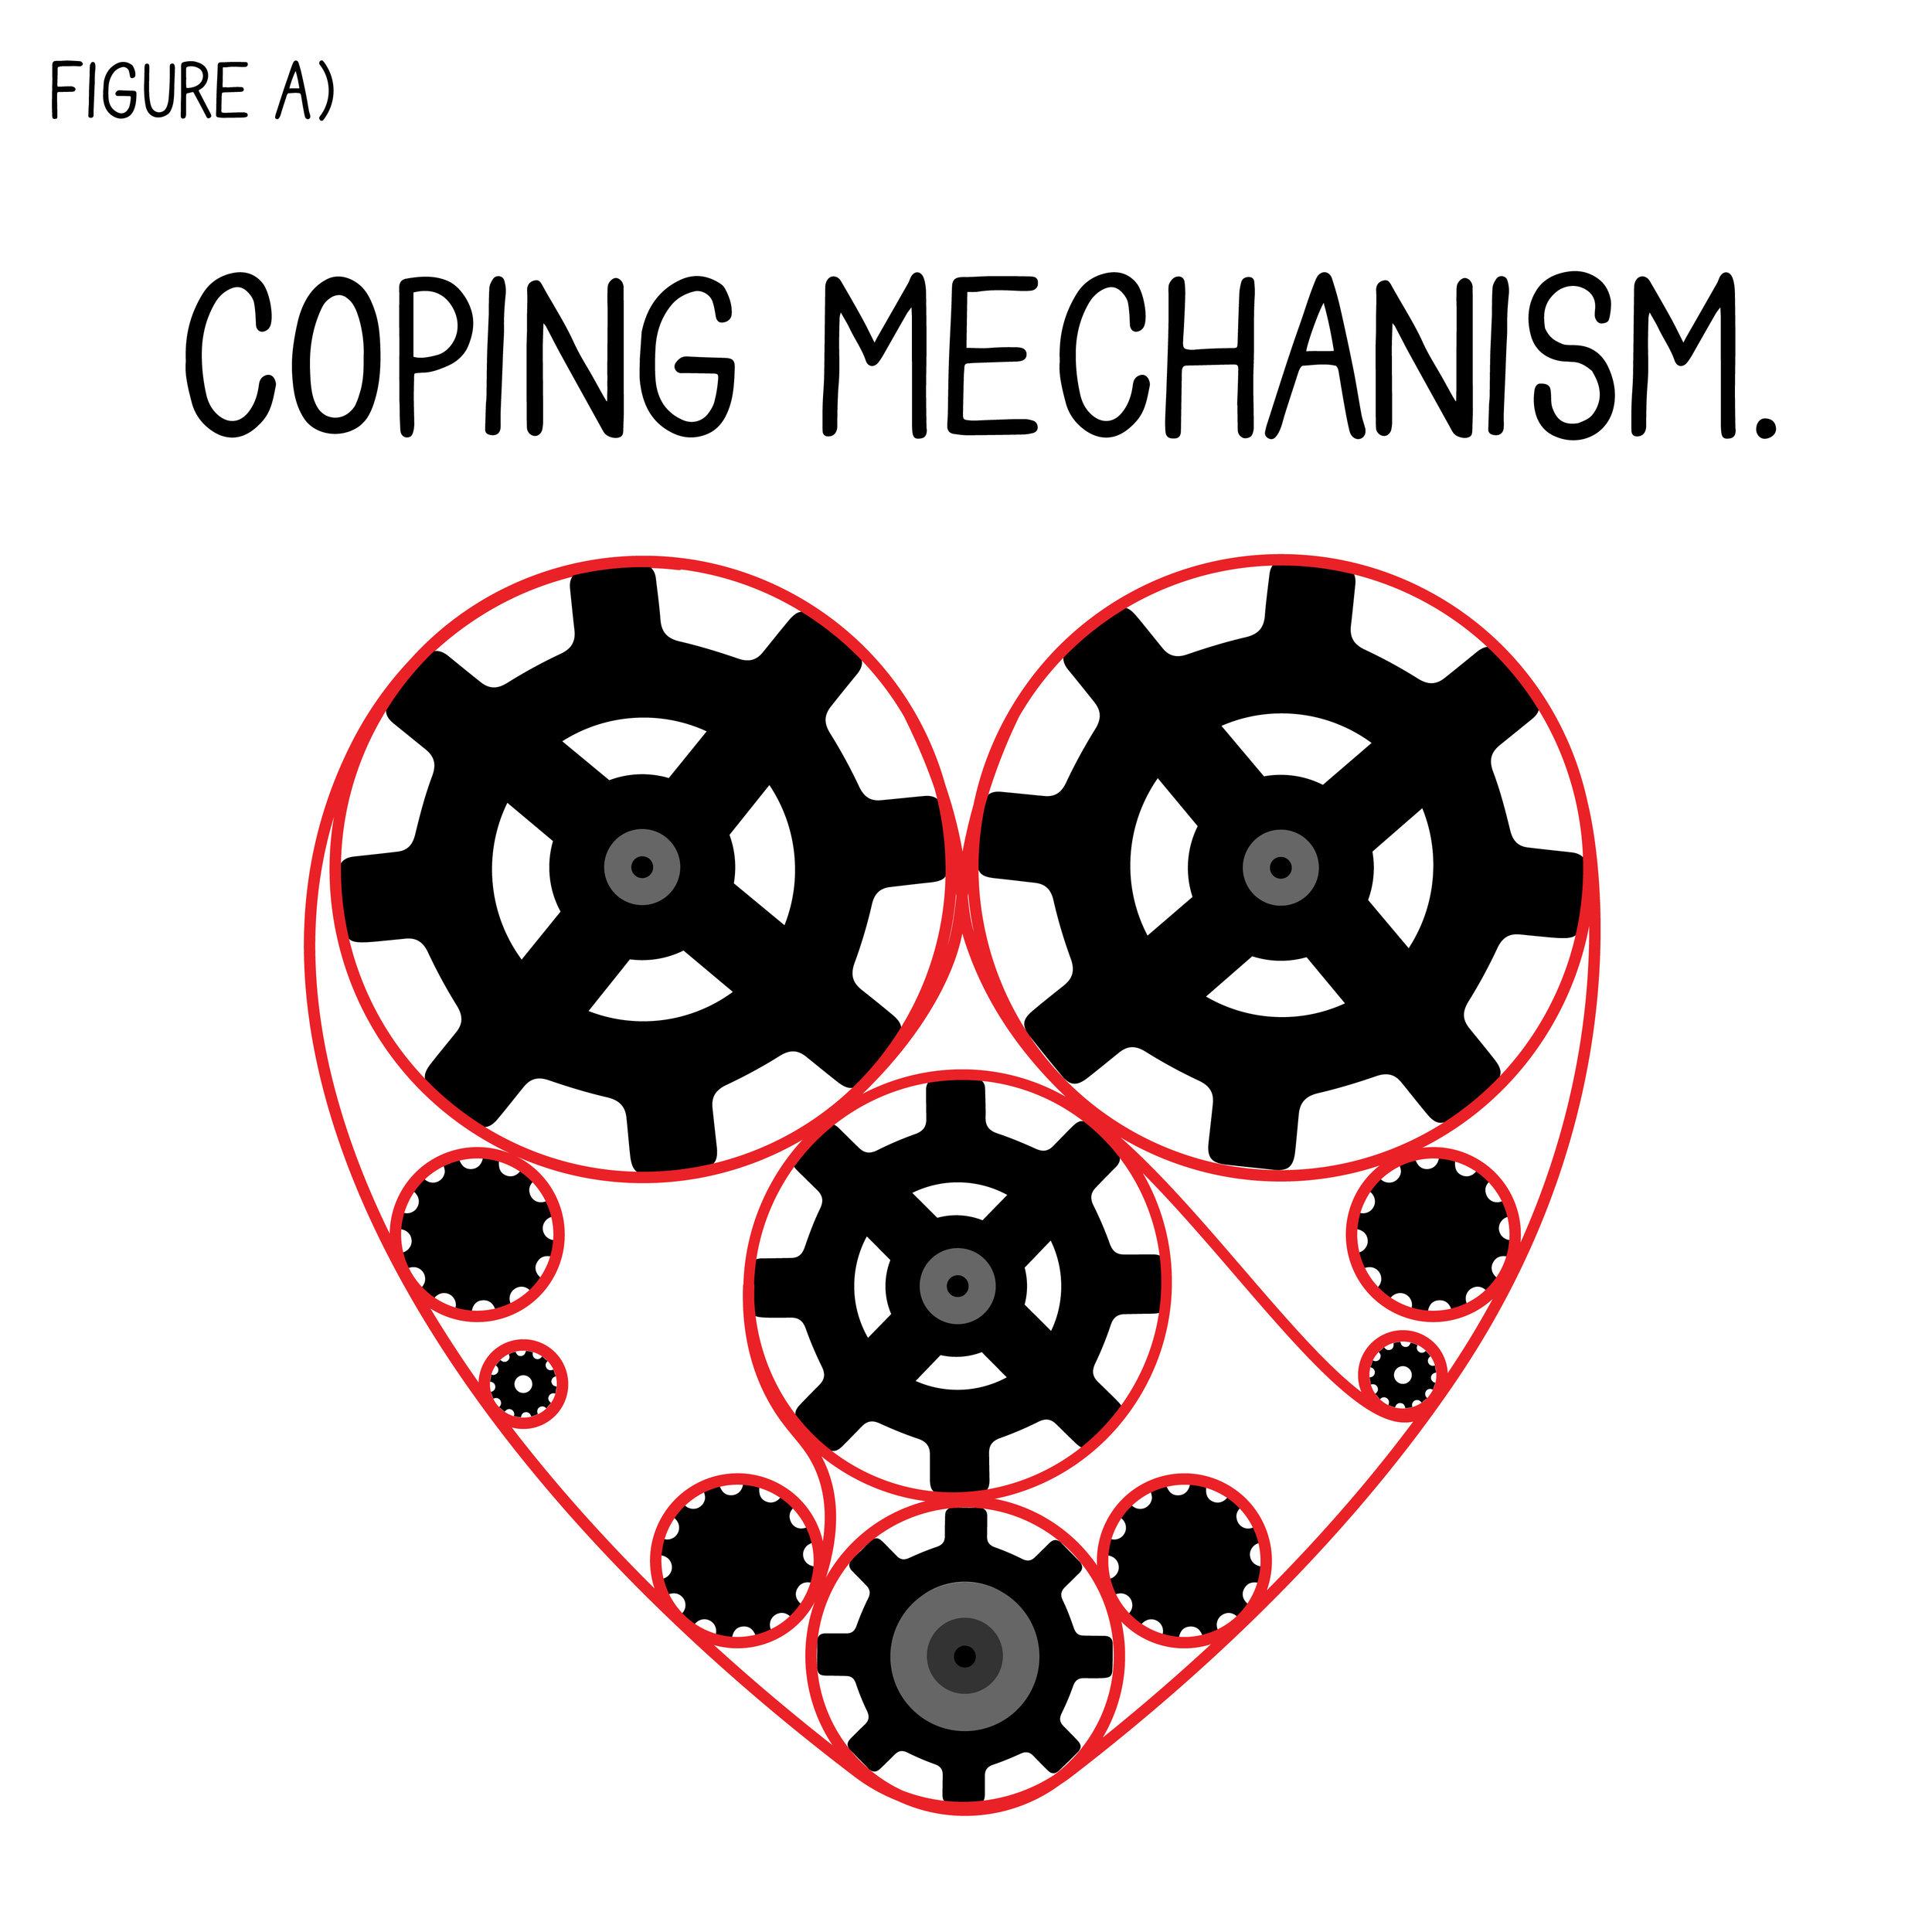 copingmechanism-01.jpg